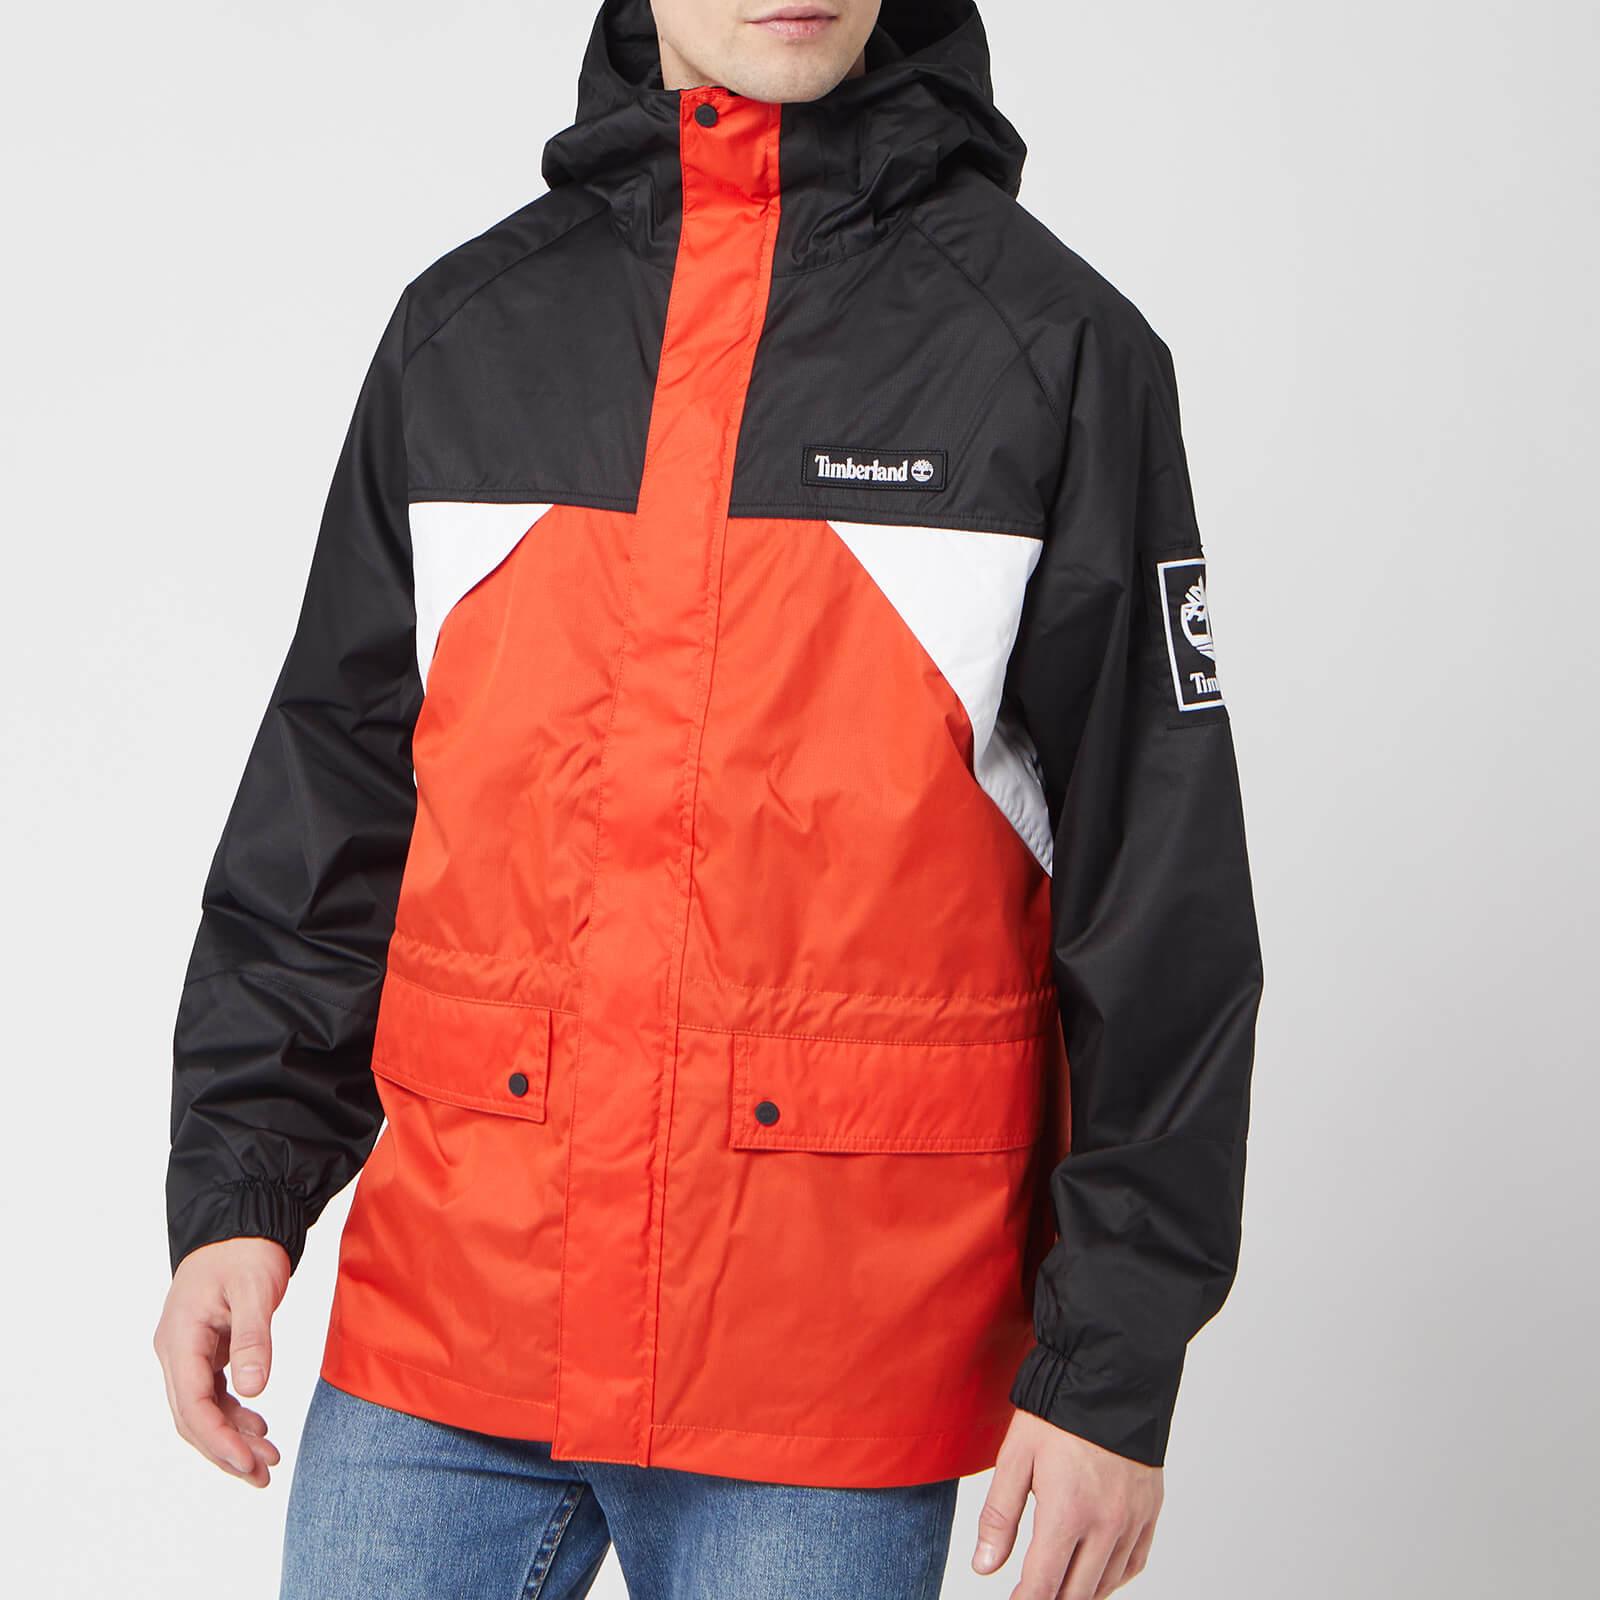 Timberland Men's Outdoor Archive Weather Breaker Coat - White/Spicy Orange/Black - L